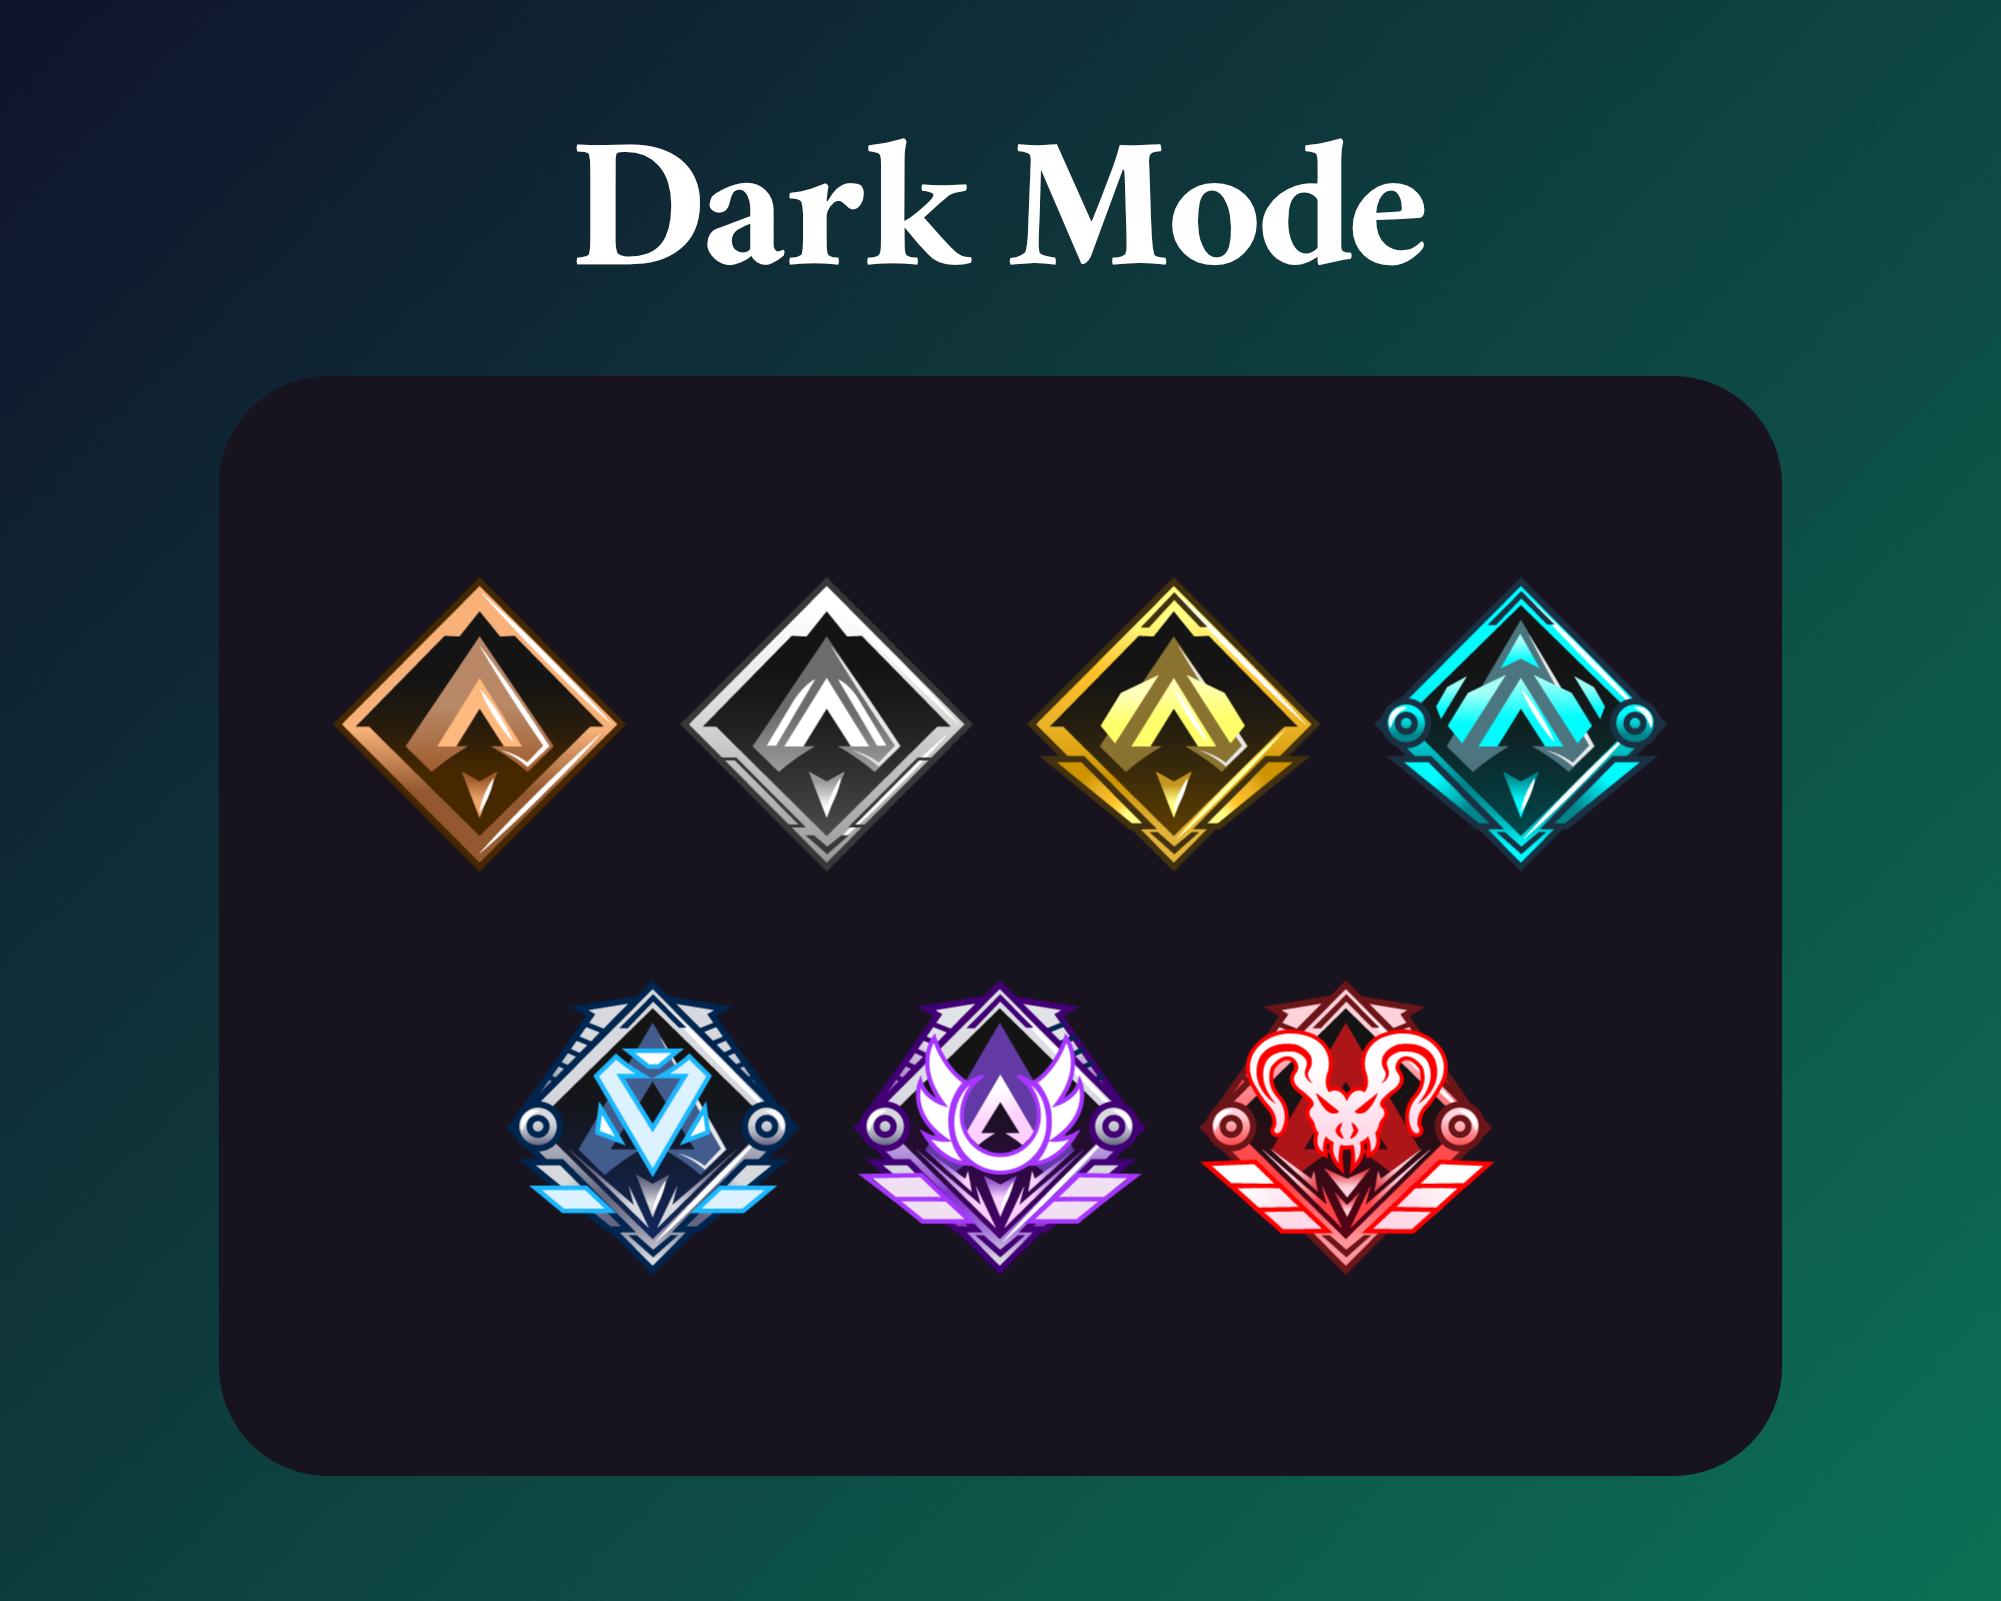 Apex legends sub badges for twitch dark mode